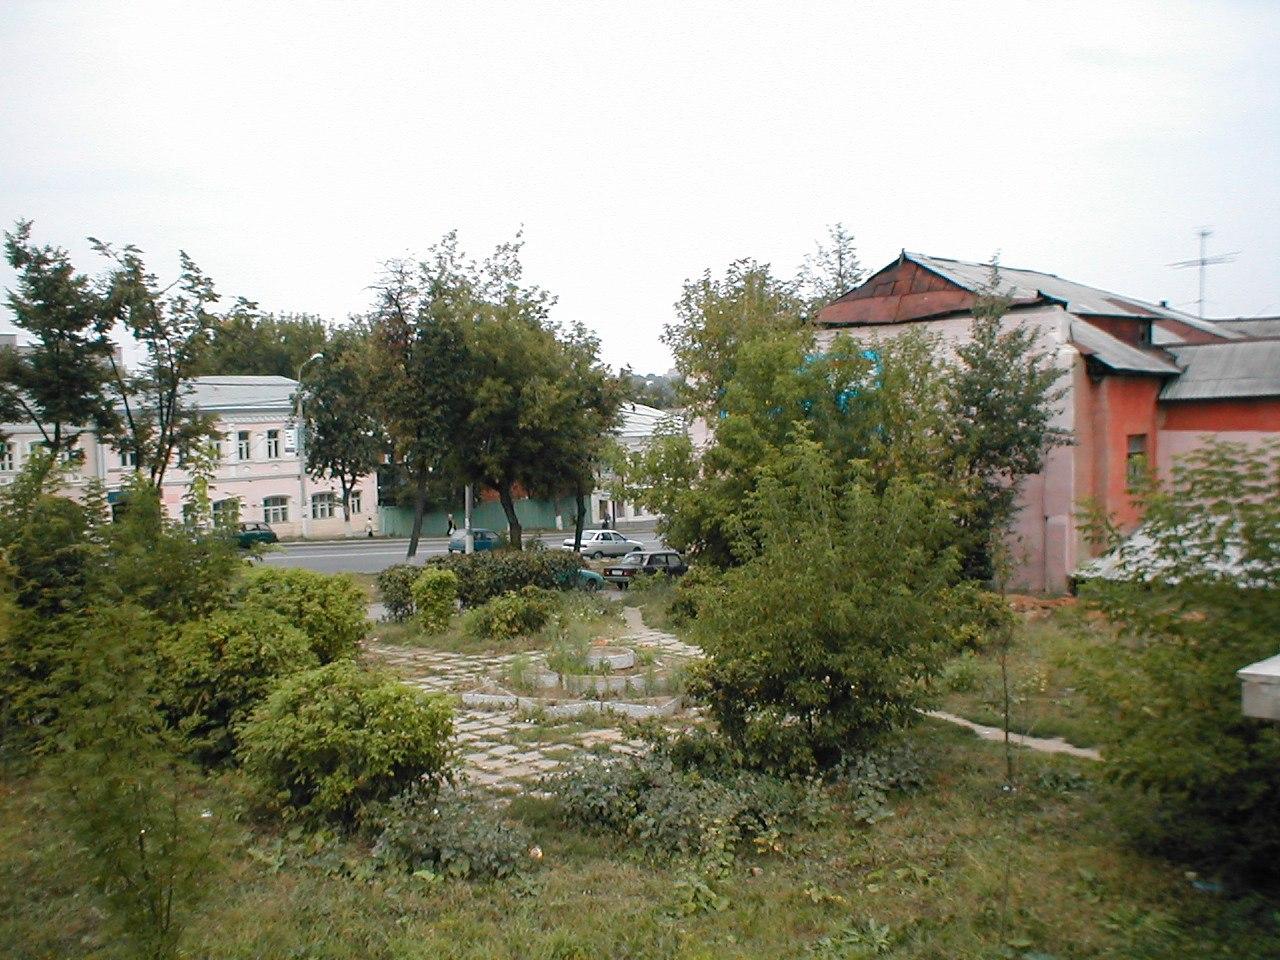 Не месте дома № 105, вид на Проспект Ленина, 2002 г.